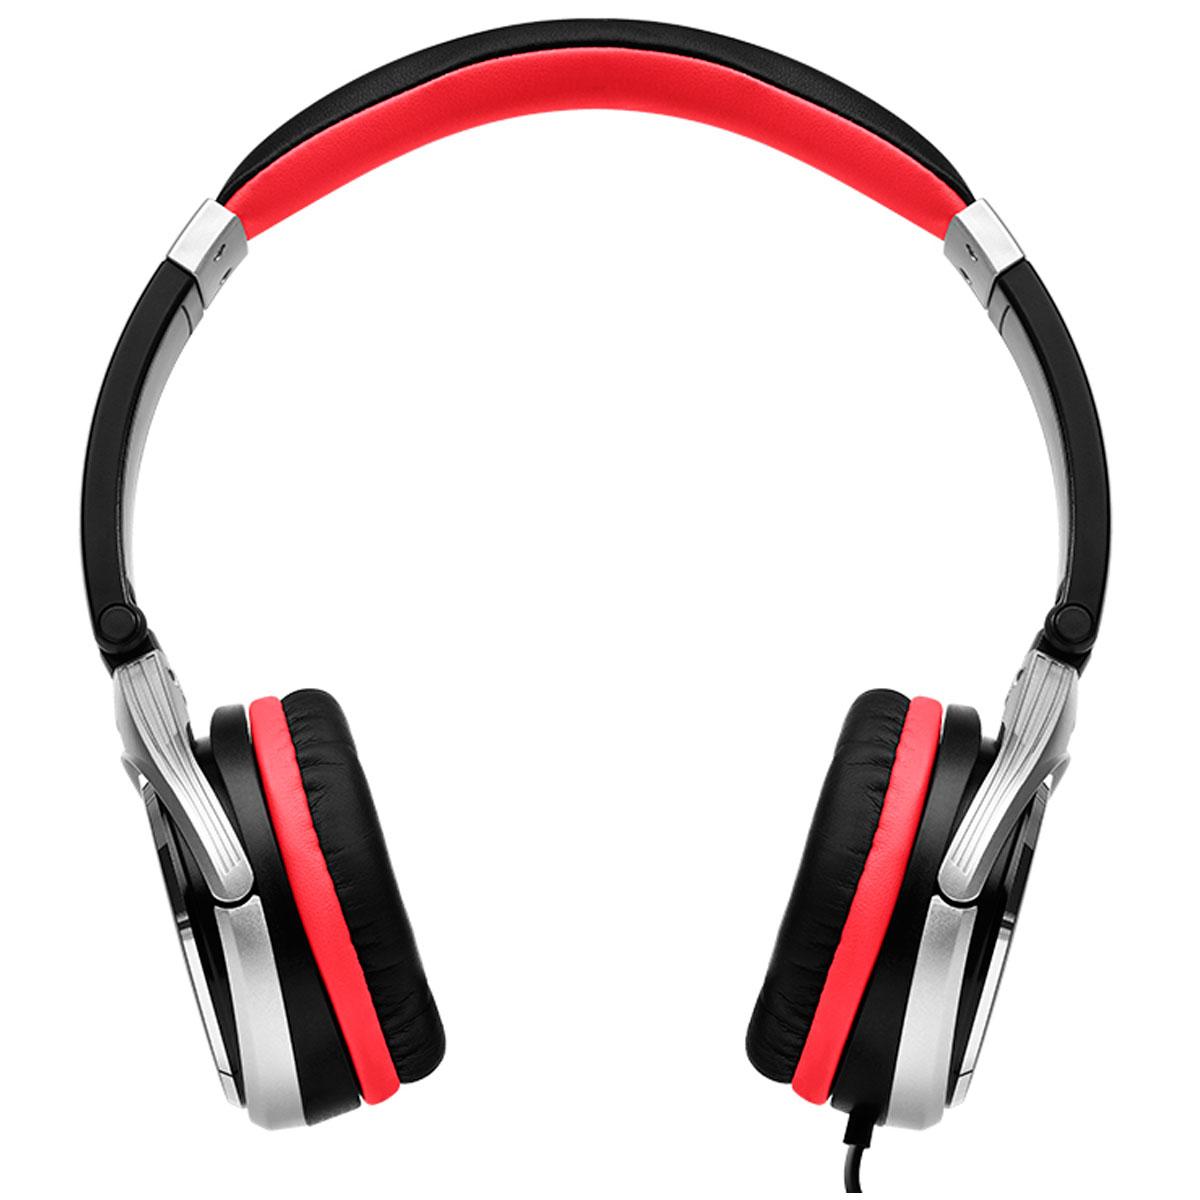 HF150 - Fone de Ouvido On-ear HF 150 - Numark